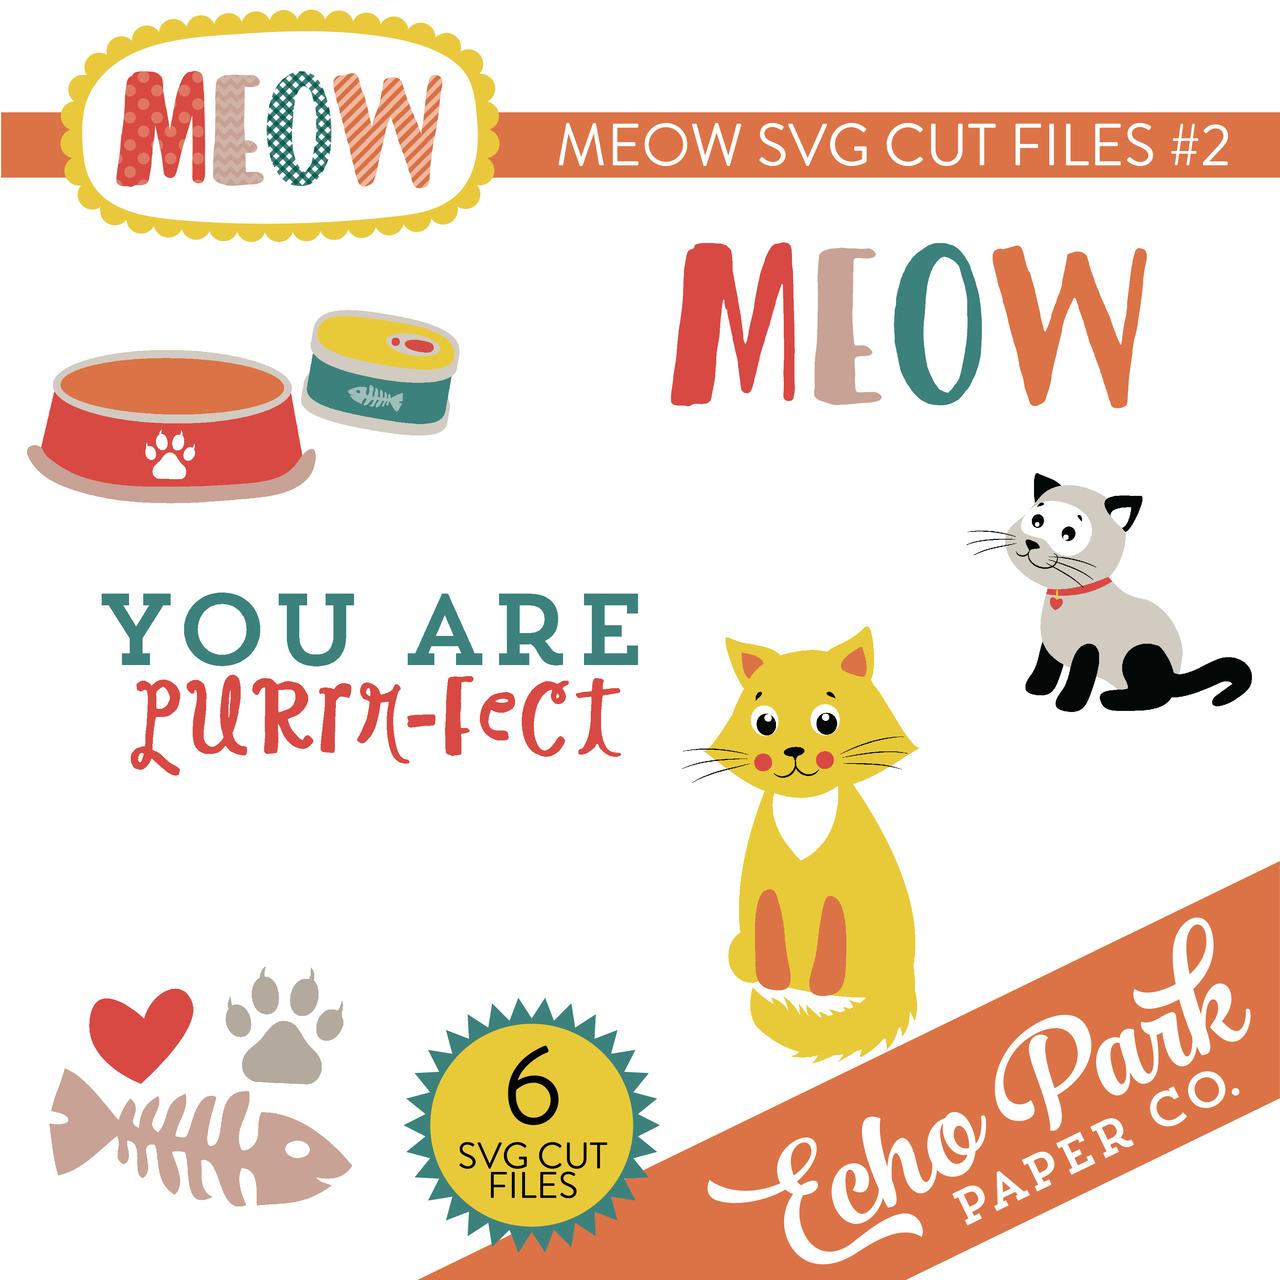 Meow SVG Cut Files #2